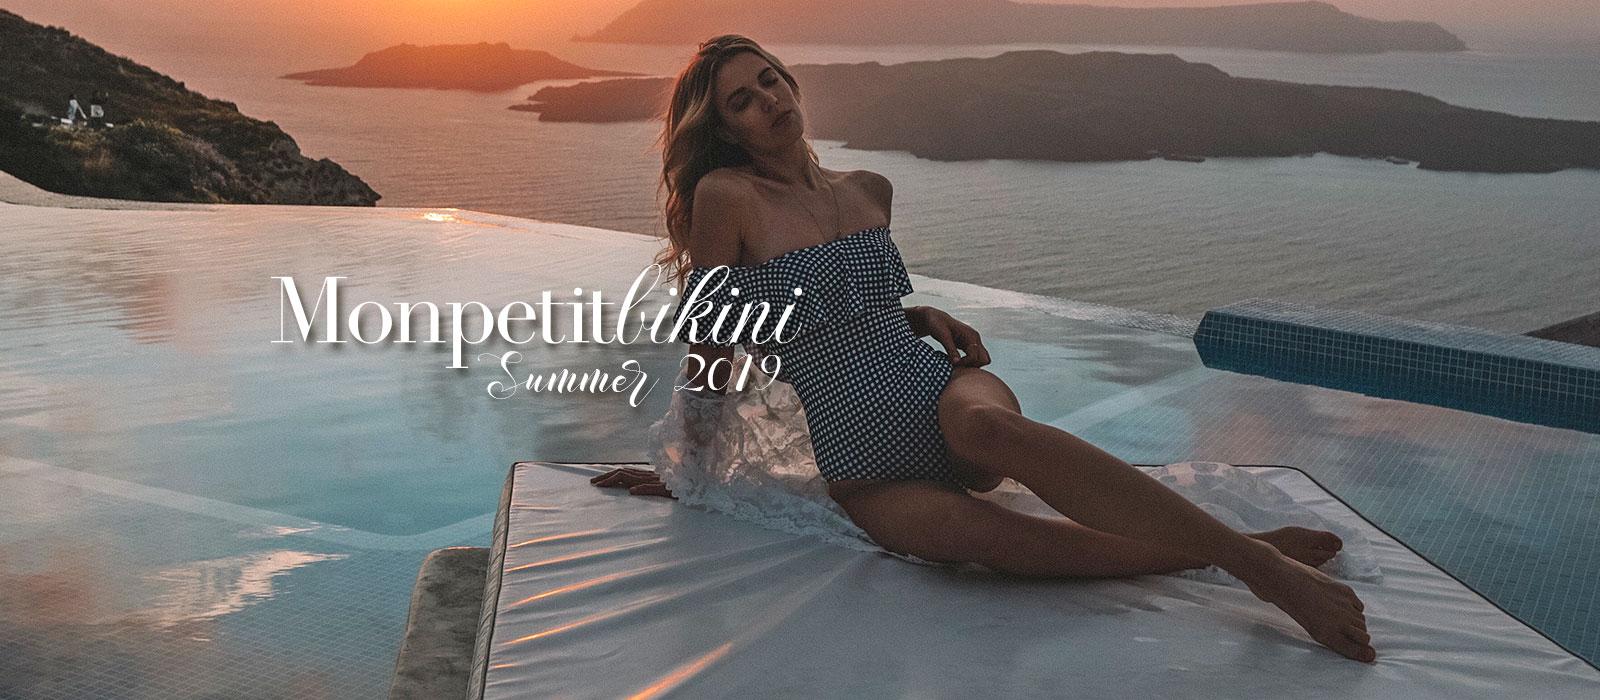 0b25f037e8 Maillot de bain - Bikini et maillot de bain femme sur MonPetitBikini